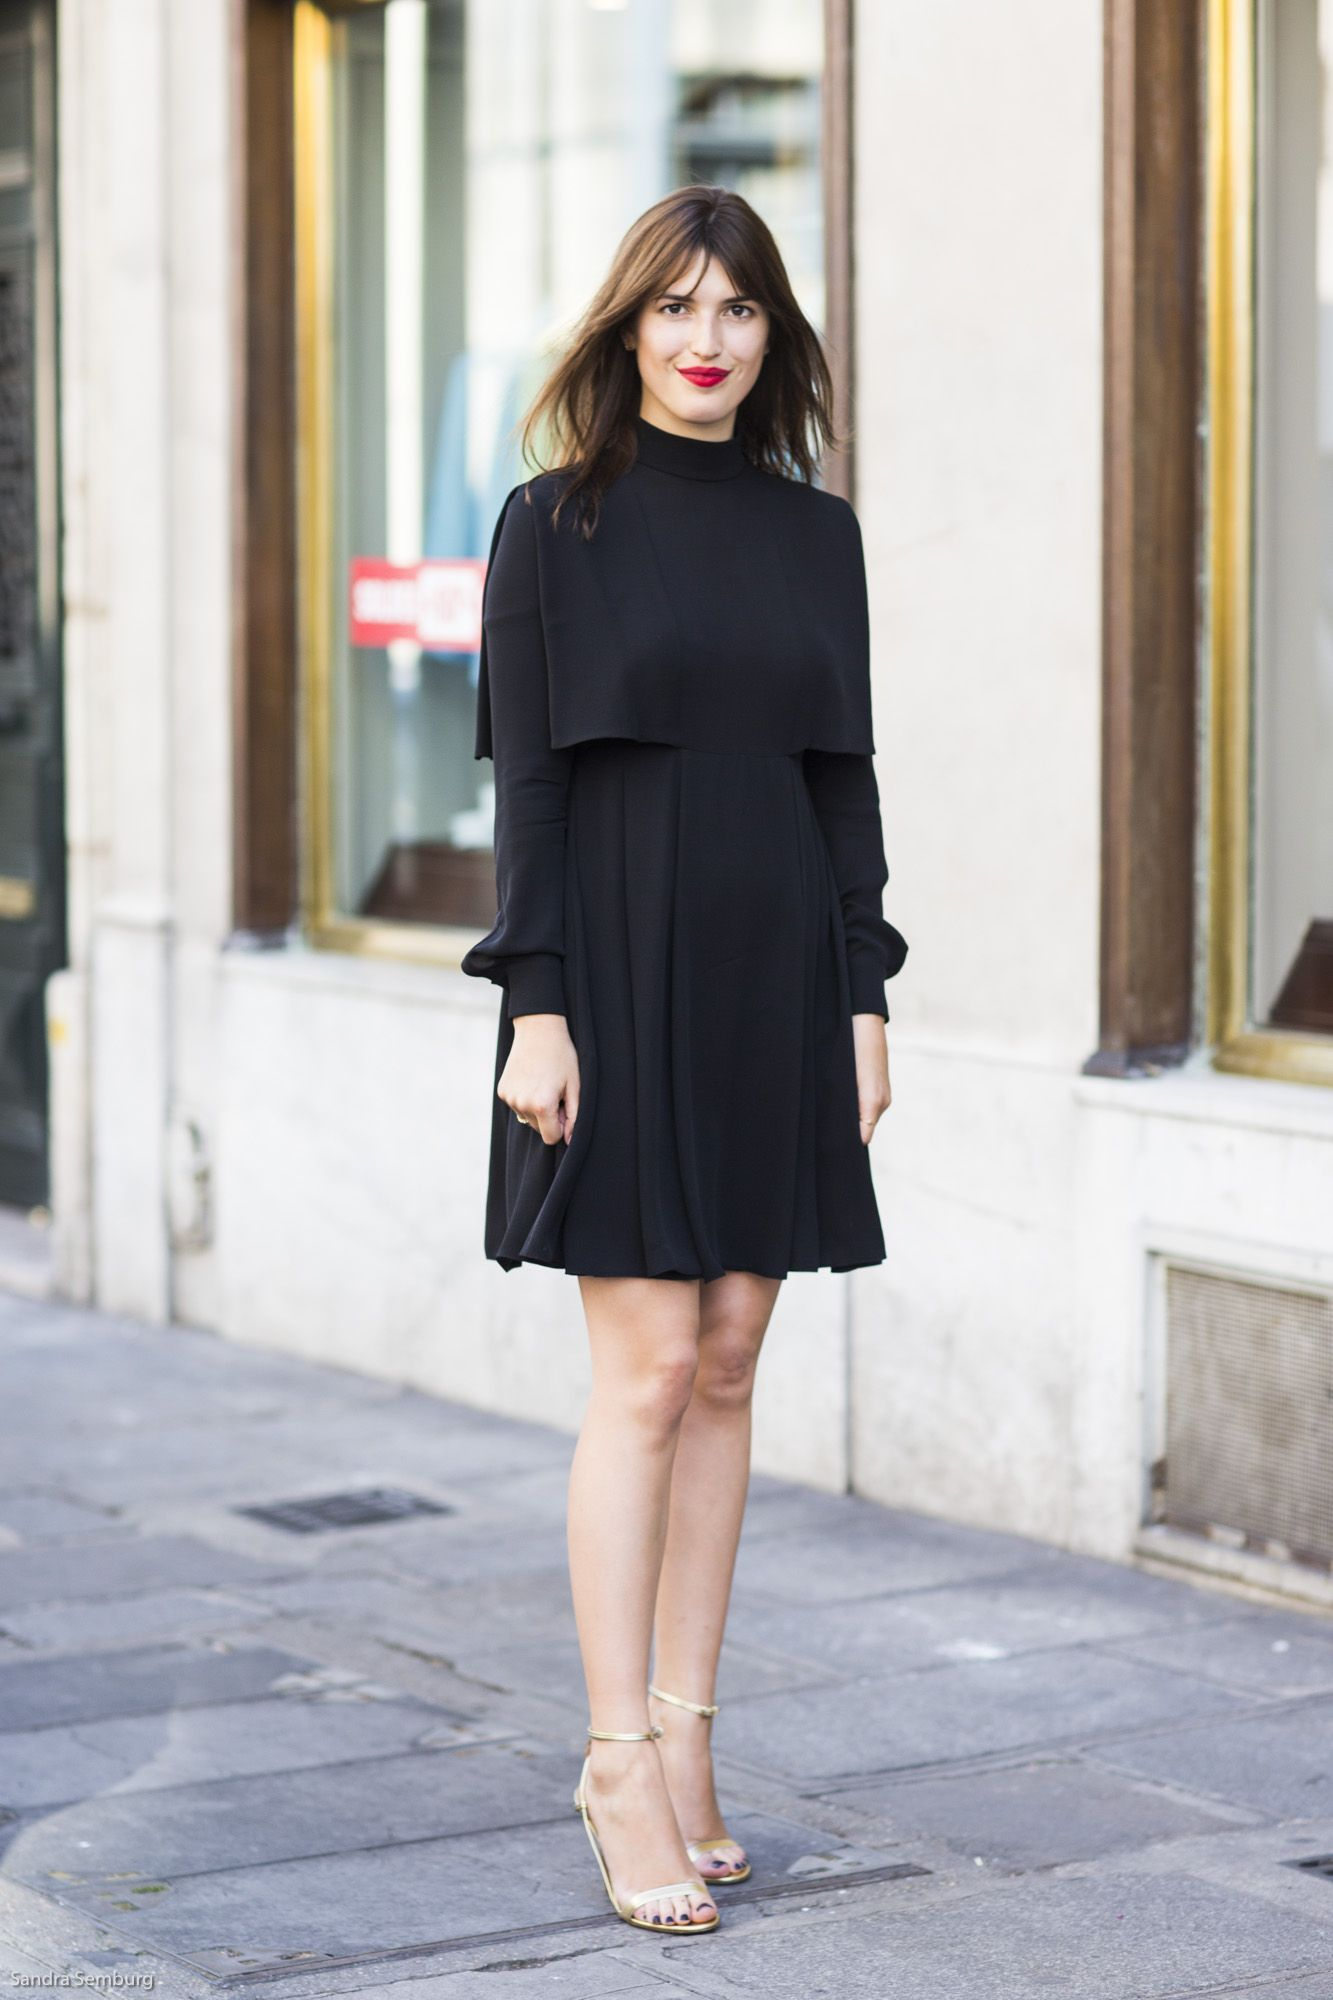 Black dress lipstick - Jeane Damas In Classy Little Black Dress Red Lipstick Gold Sandals Street